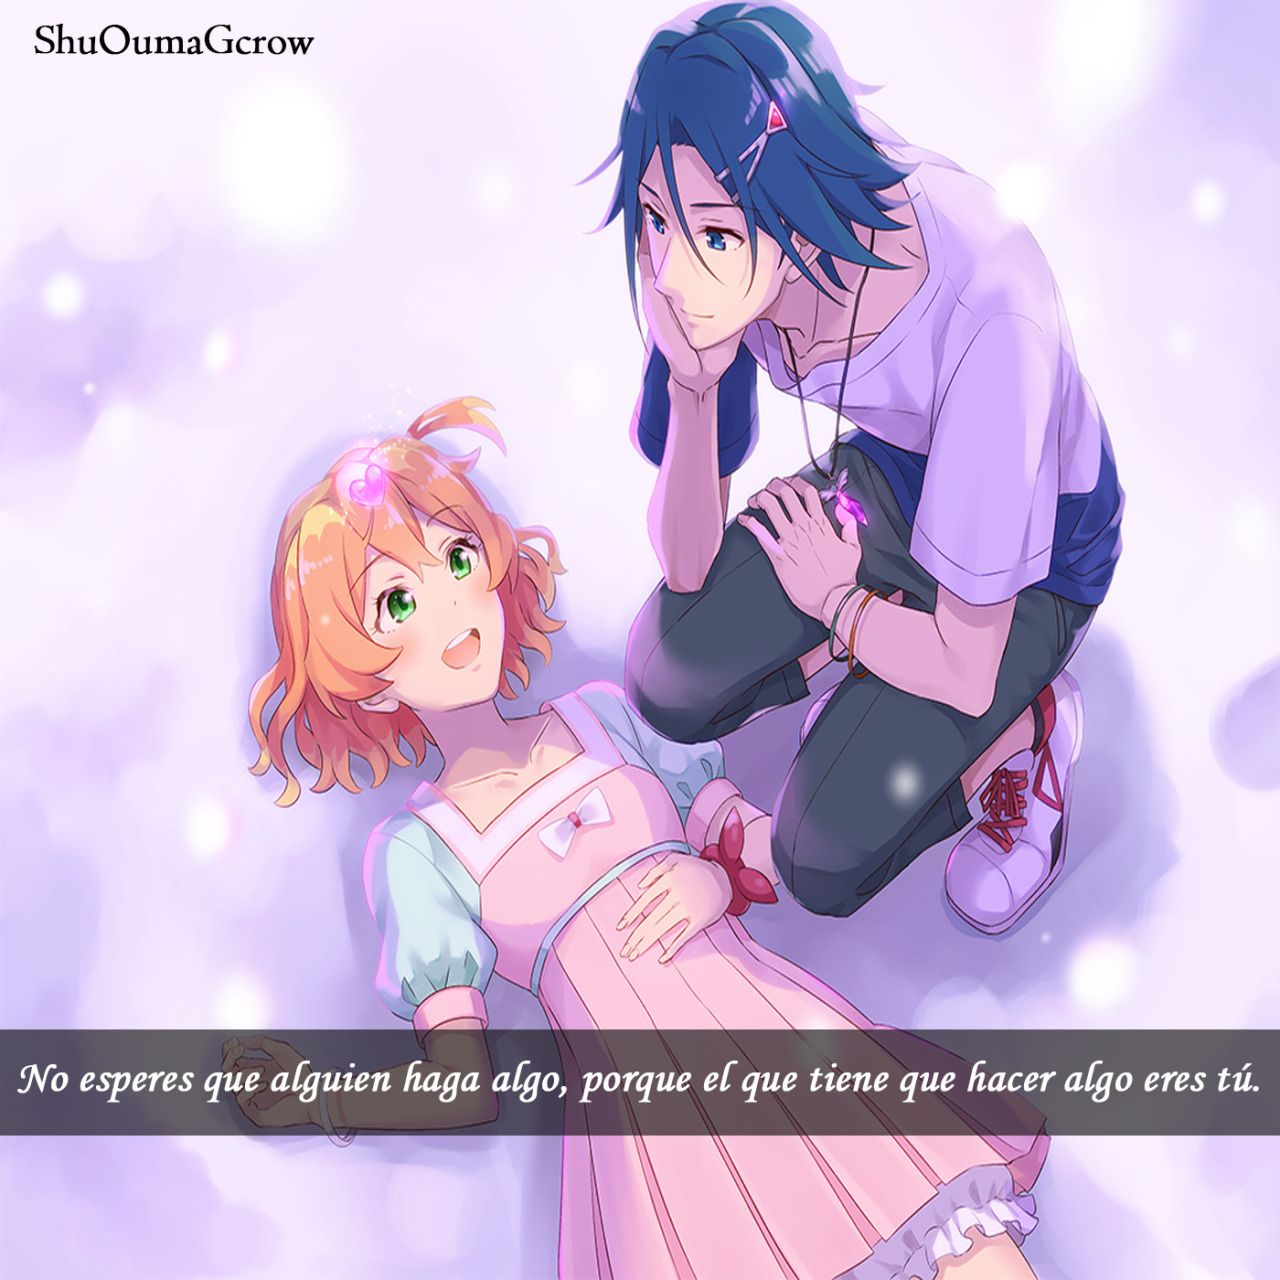 Toma valor y hazlo tu. #Anime #Frases_anime #frases